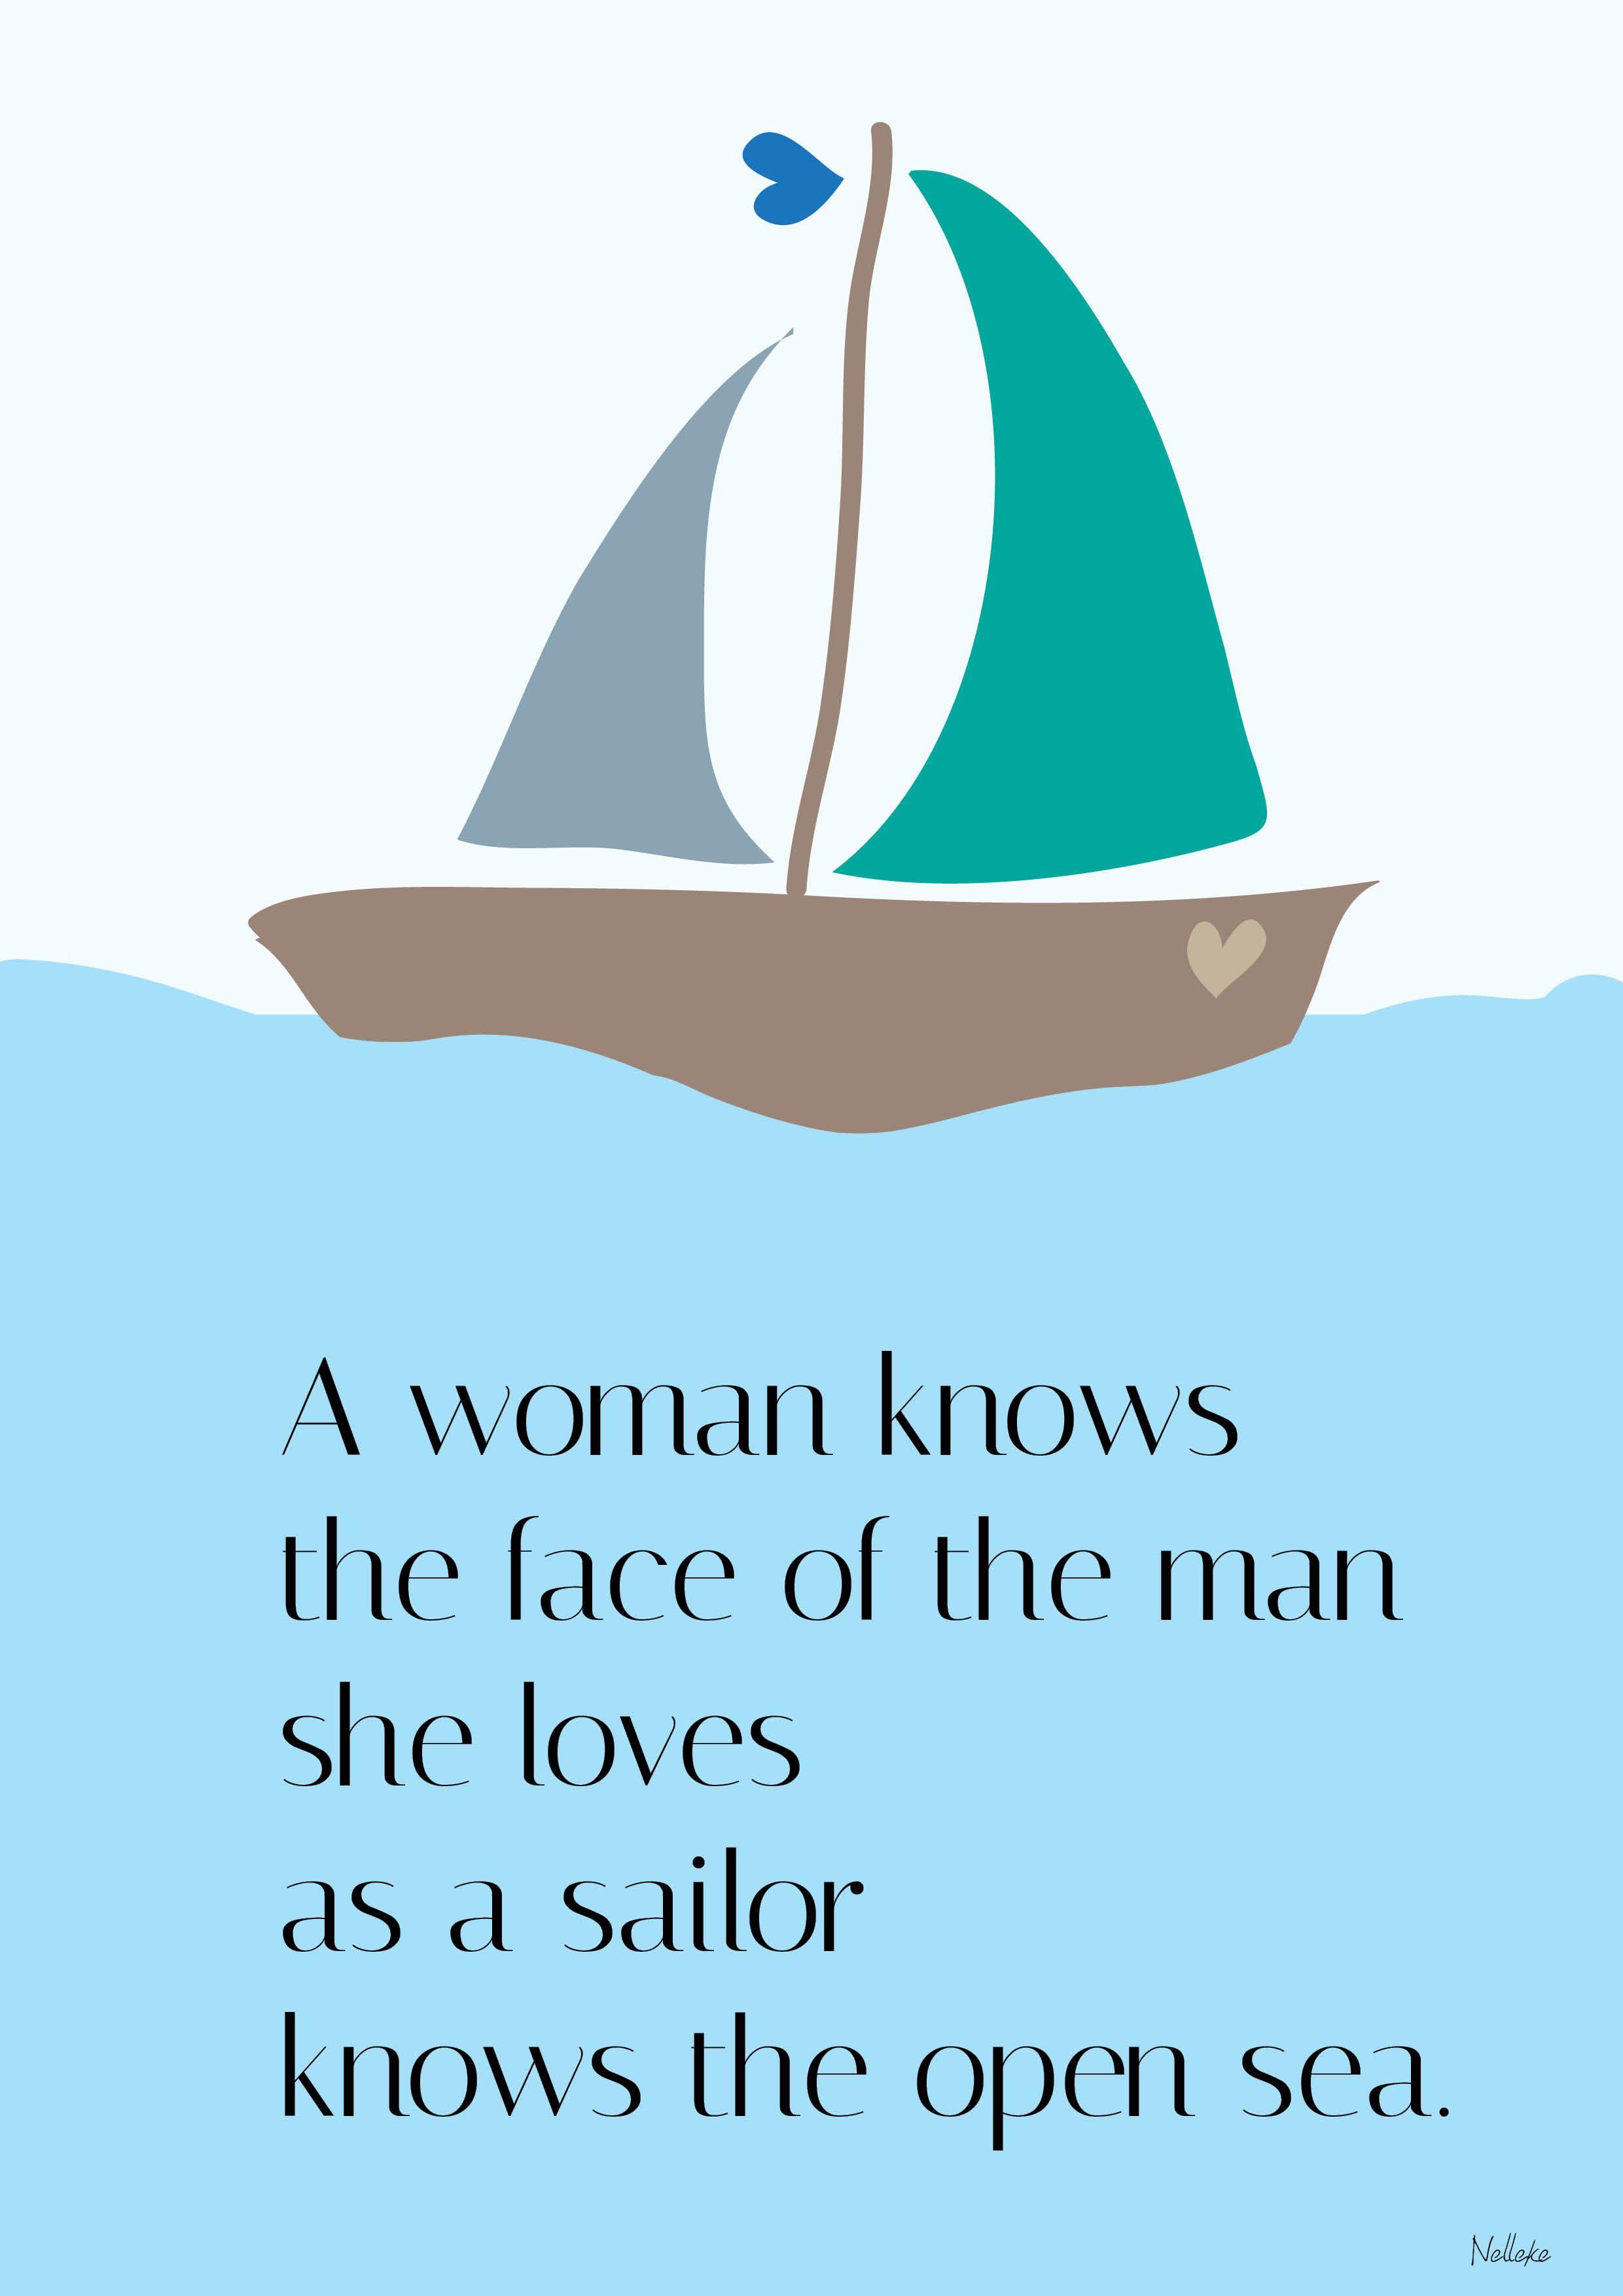 Sailor Love Quotes : sailor, quotes, Quote, Inspiration, @Nobeltec, Range, Products, Www.nobeltec.com/products, #quote, #wisdom, #saili…, Quotes,, Sailing, Storm, Quotes